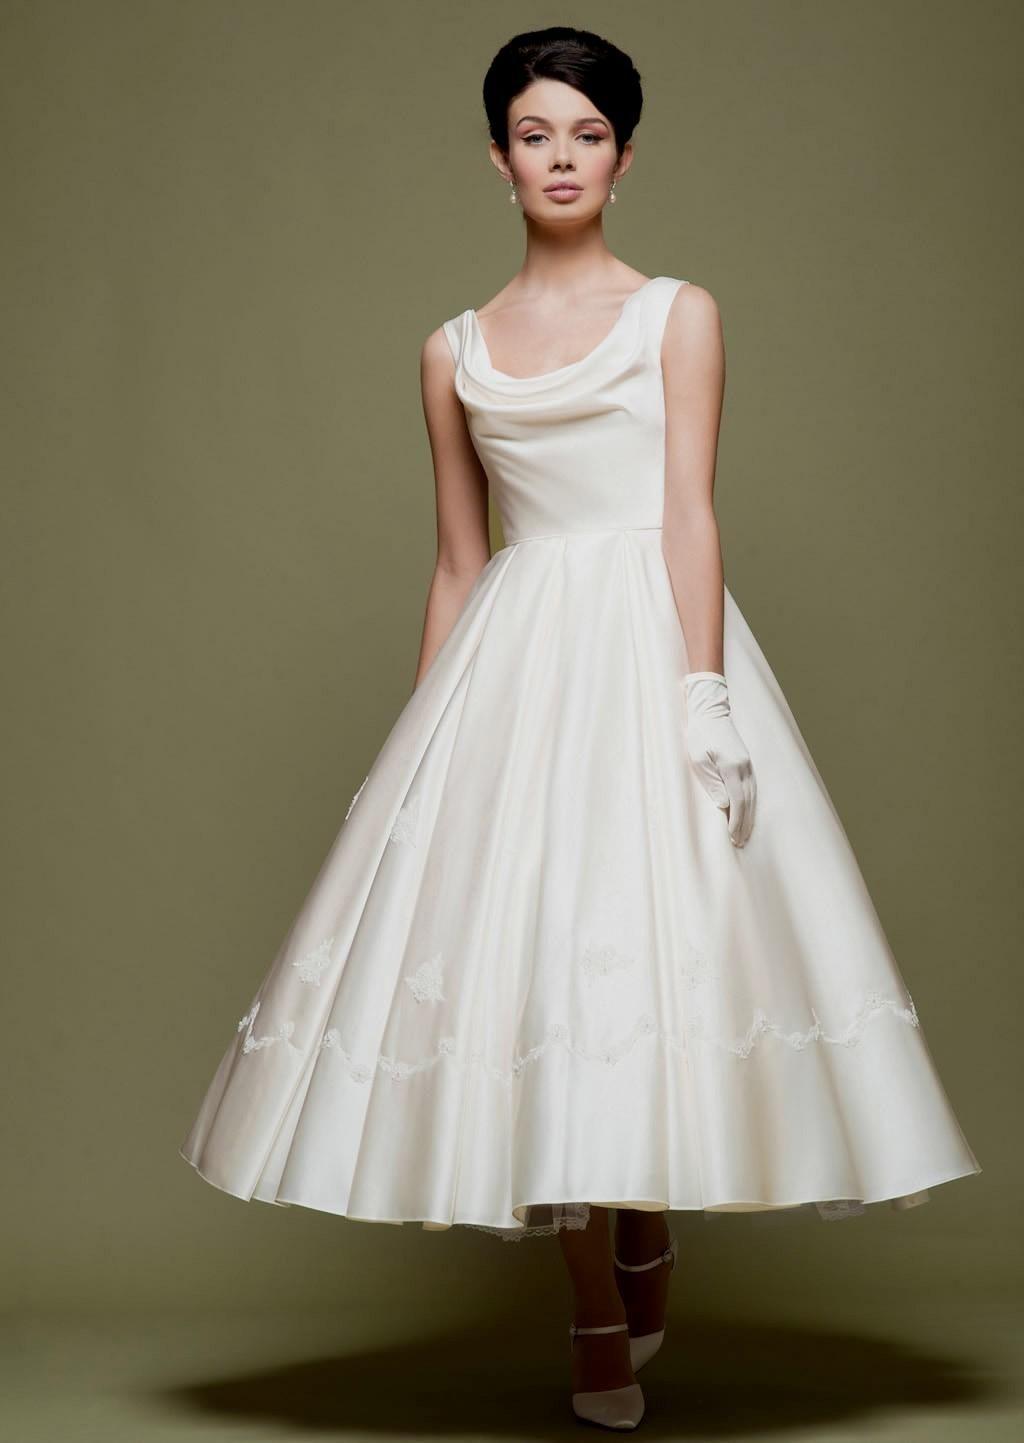 Fifties Style Wedding Dress